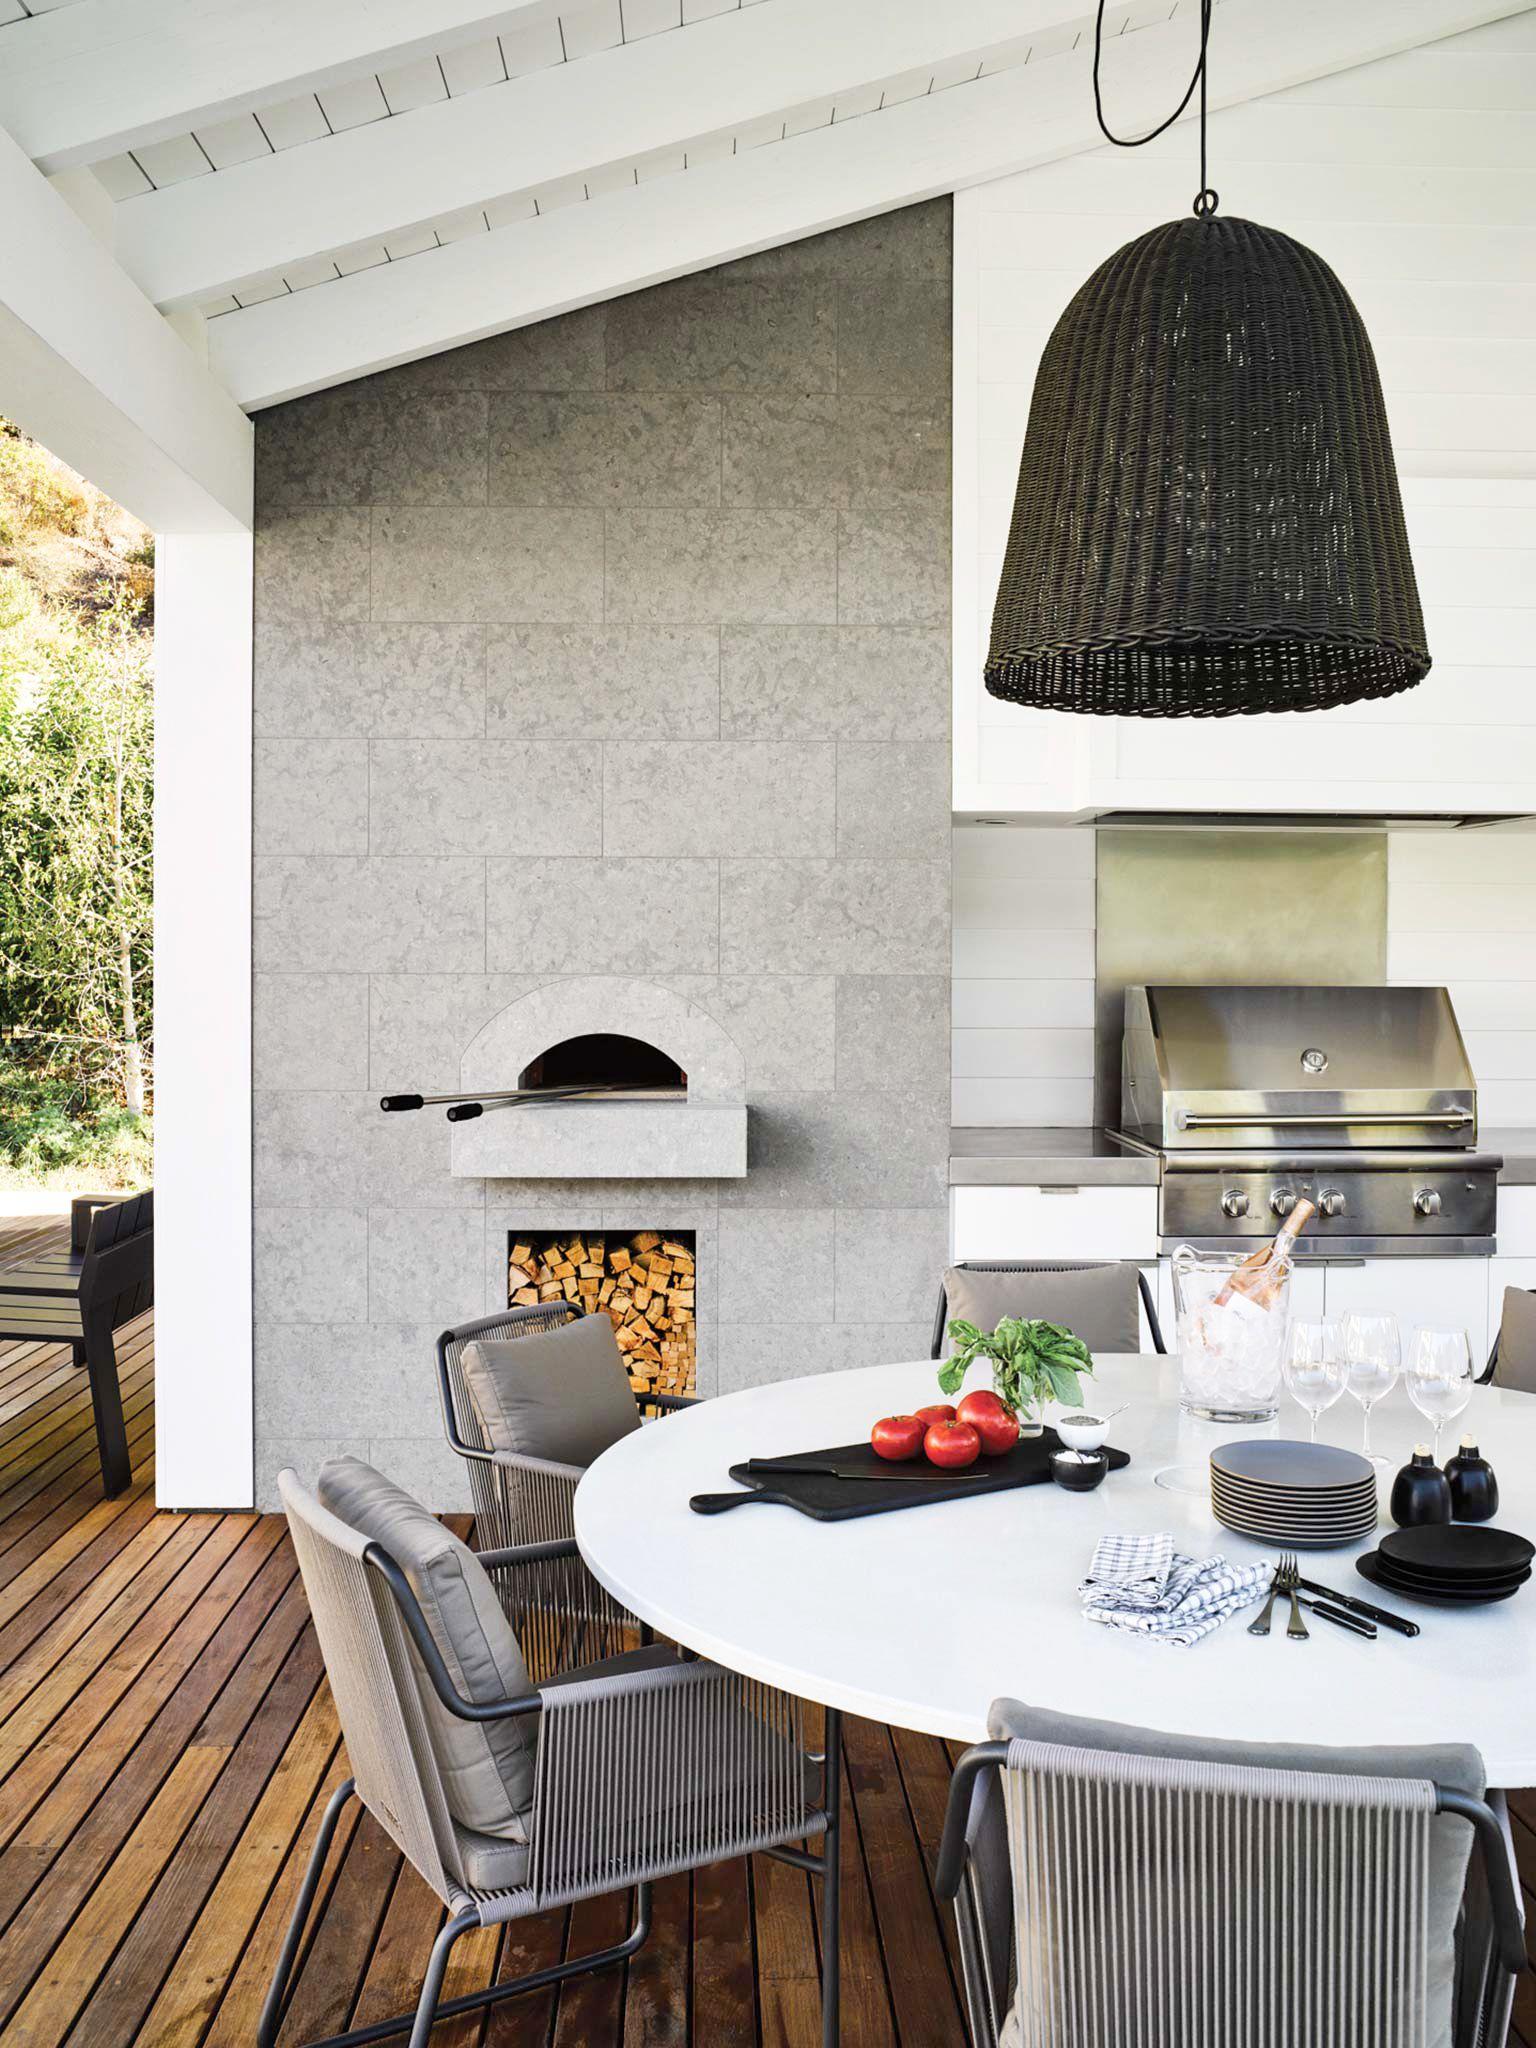 15 outdoor kitchen design ideas and